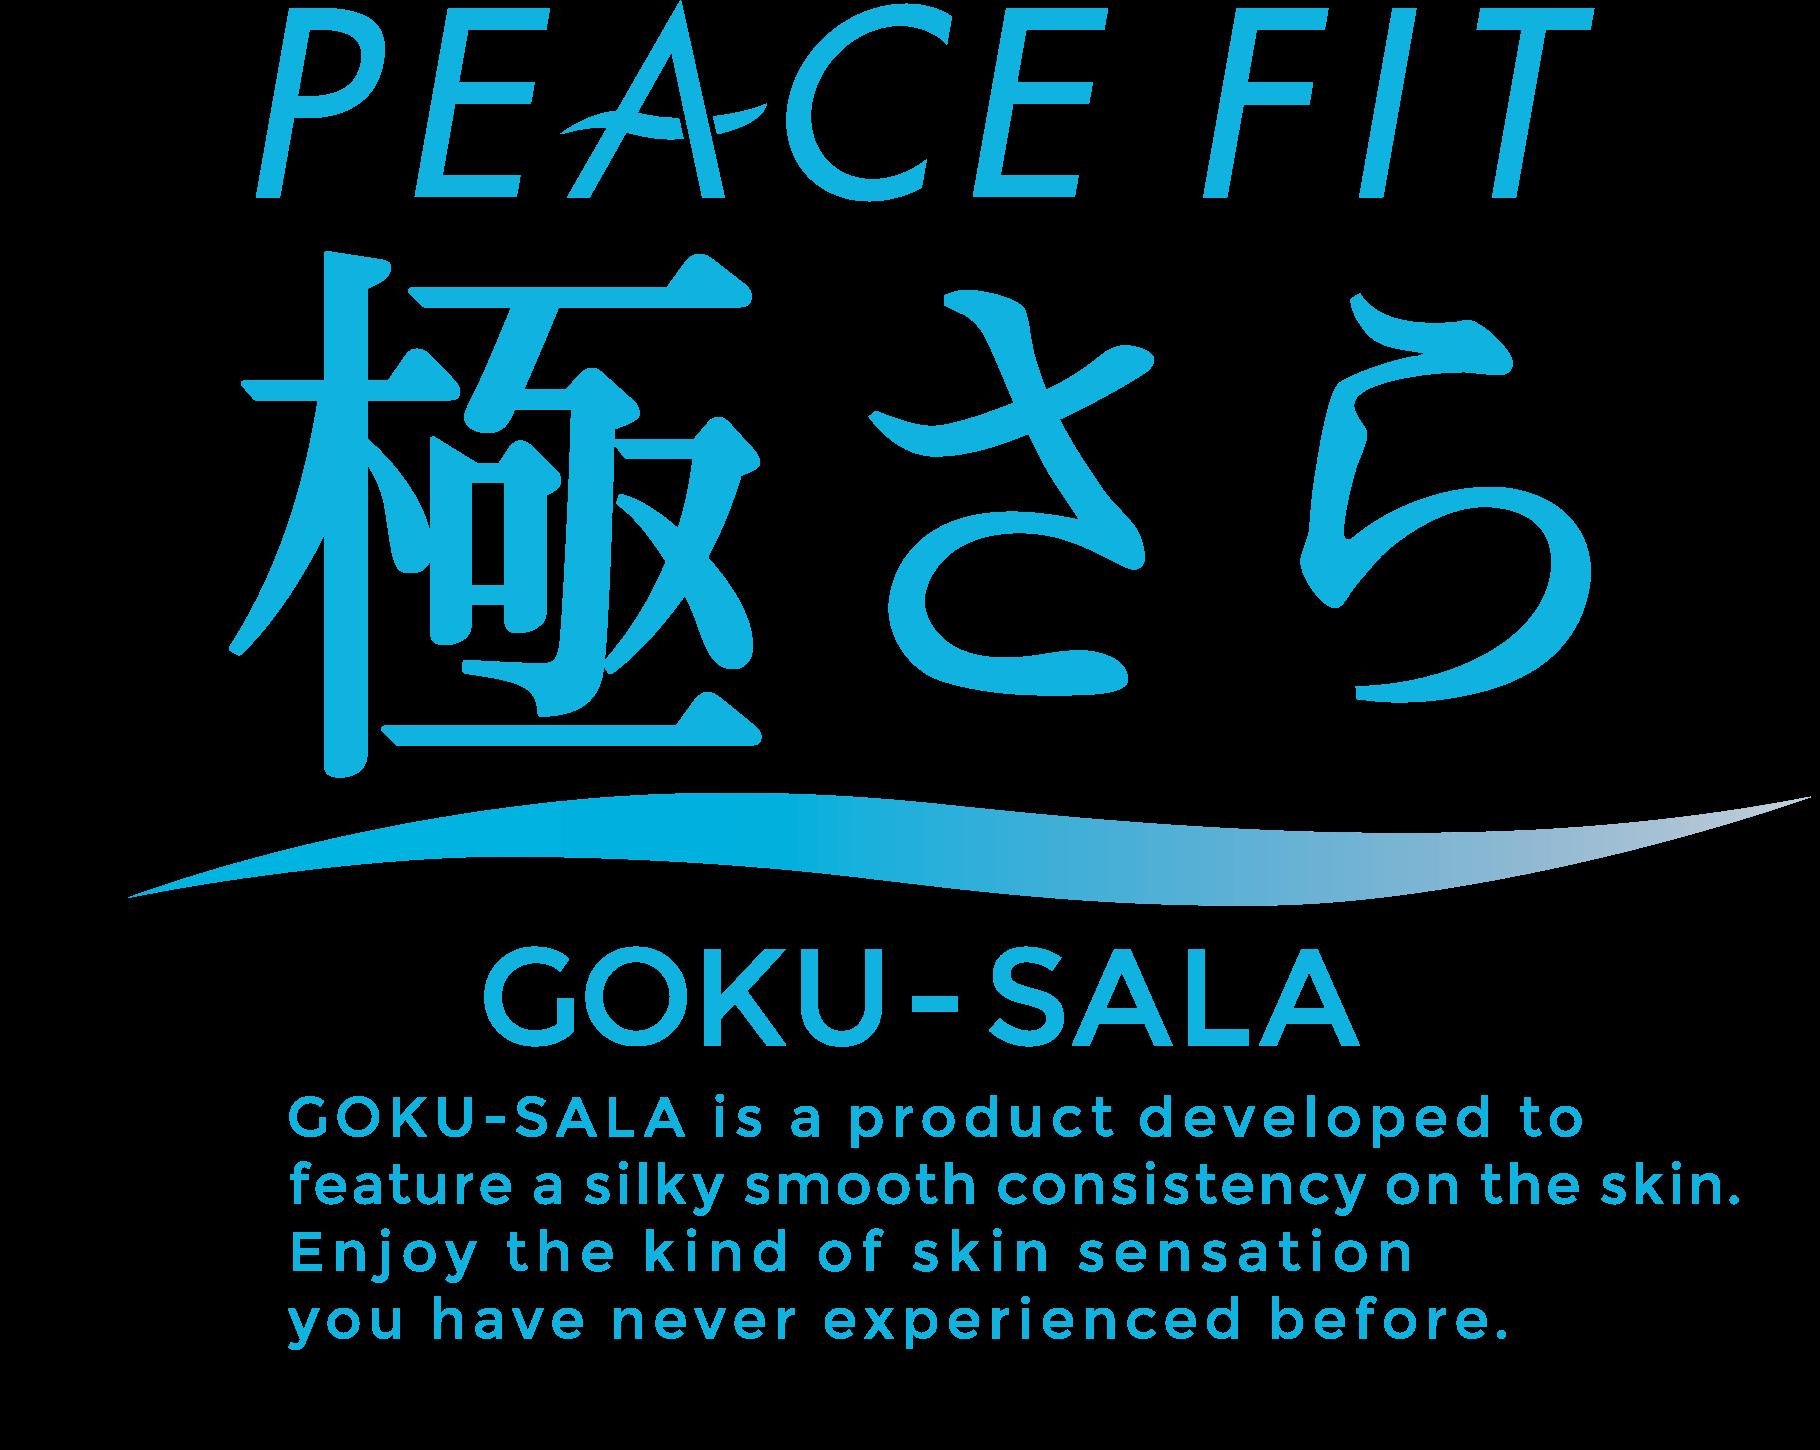 PEACE FIF 極さら GOKU - SALA